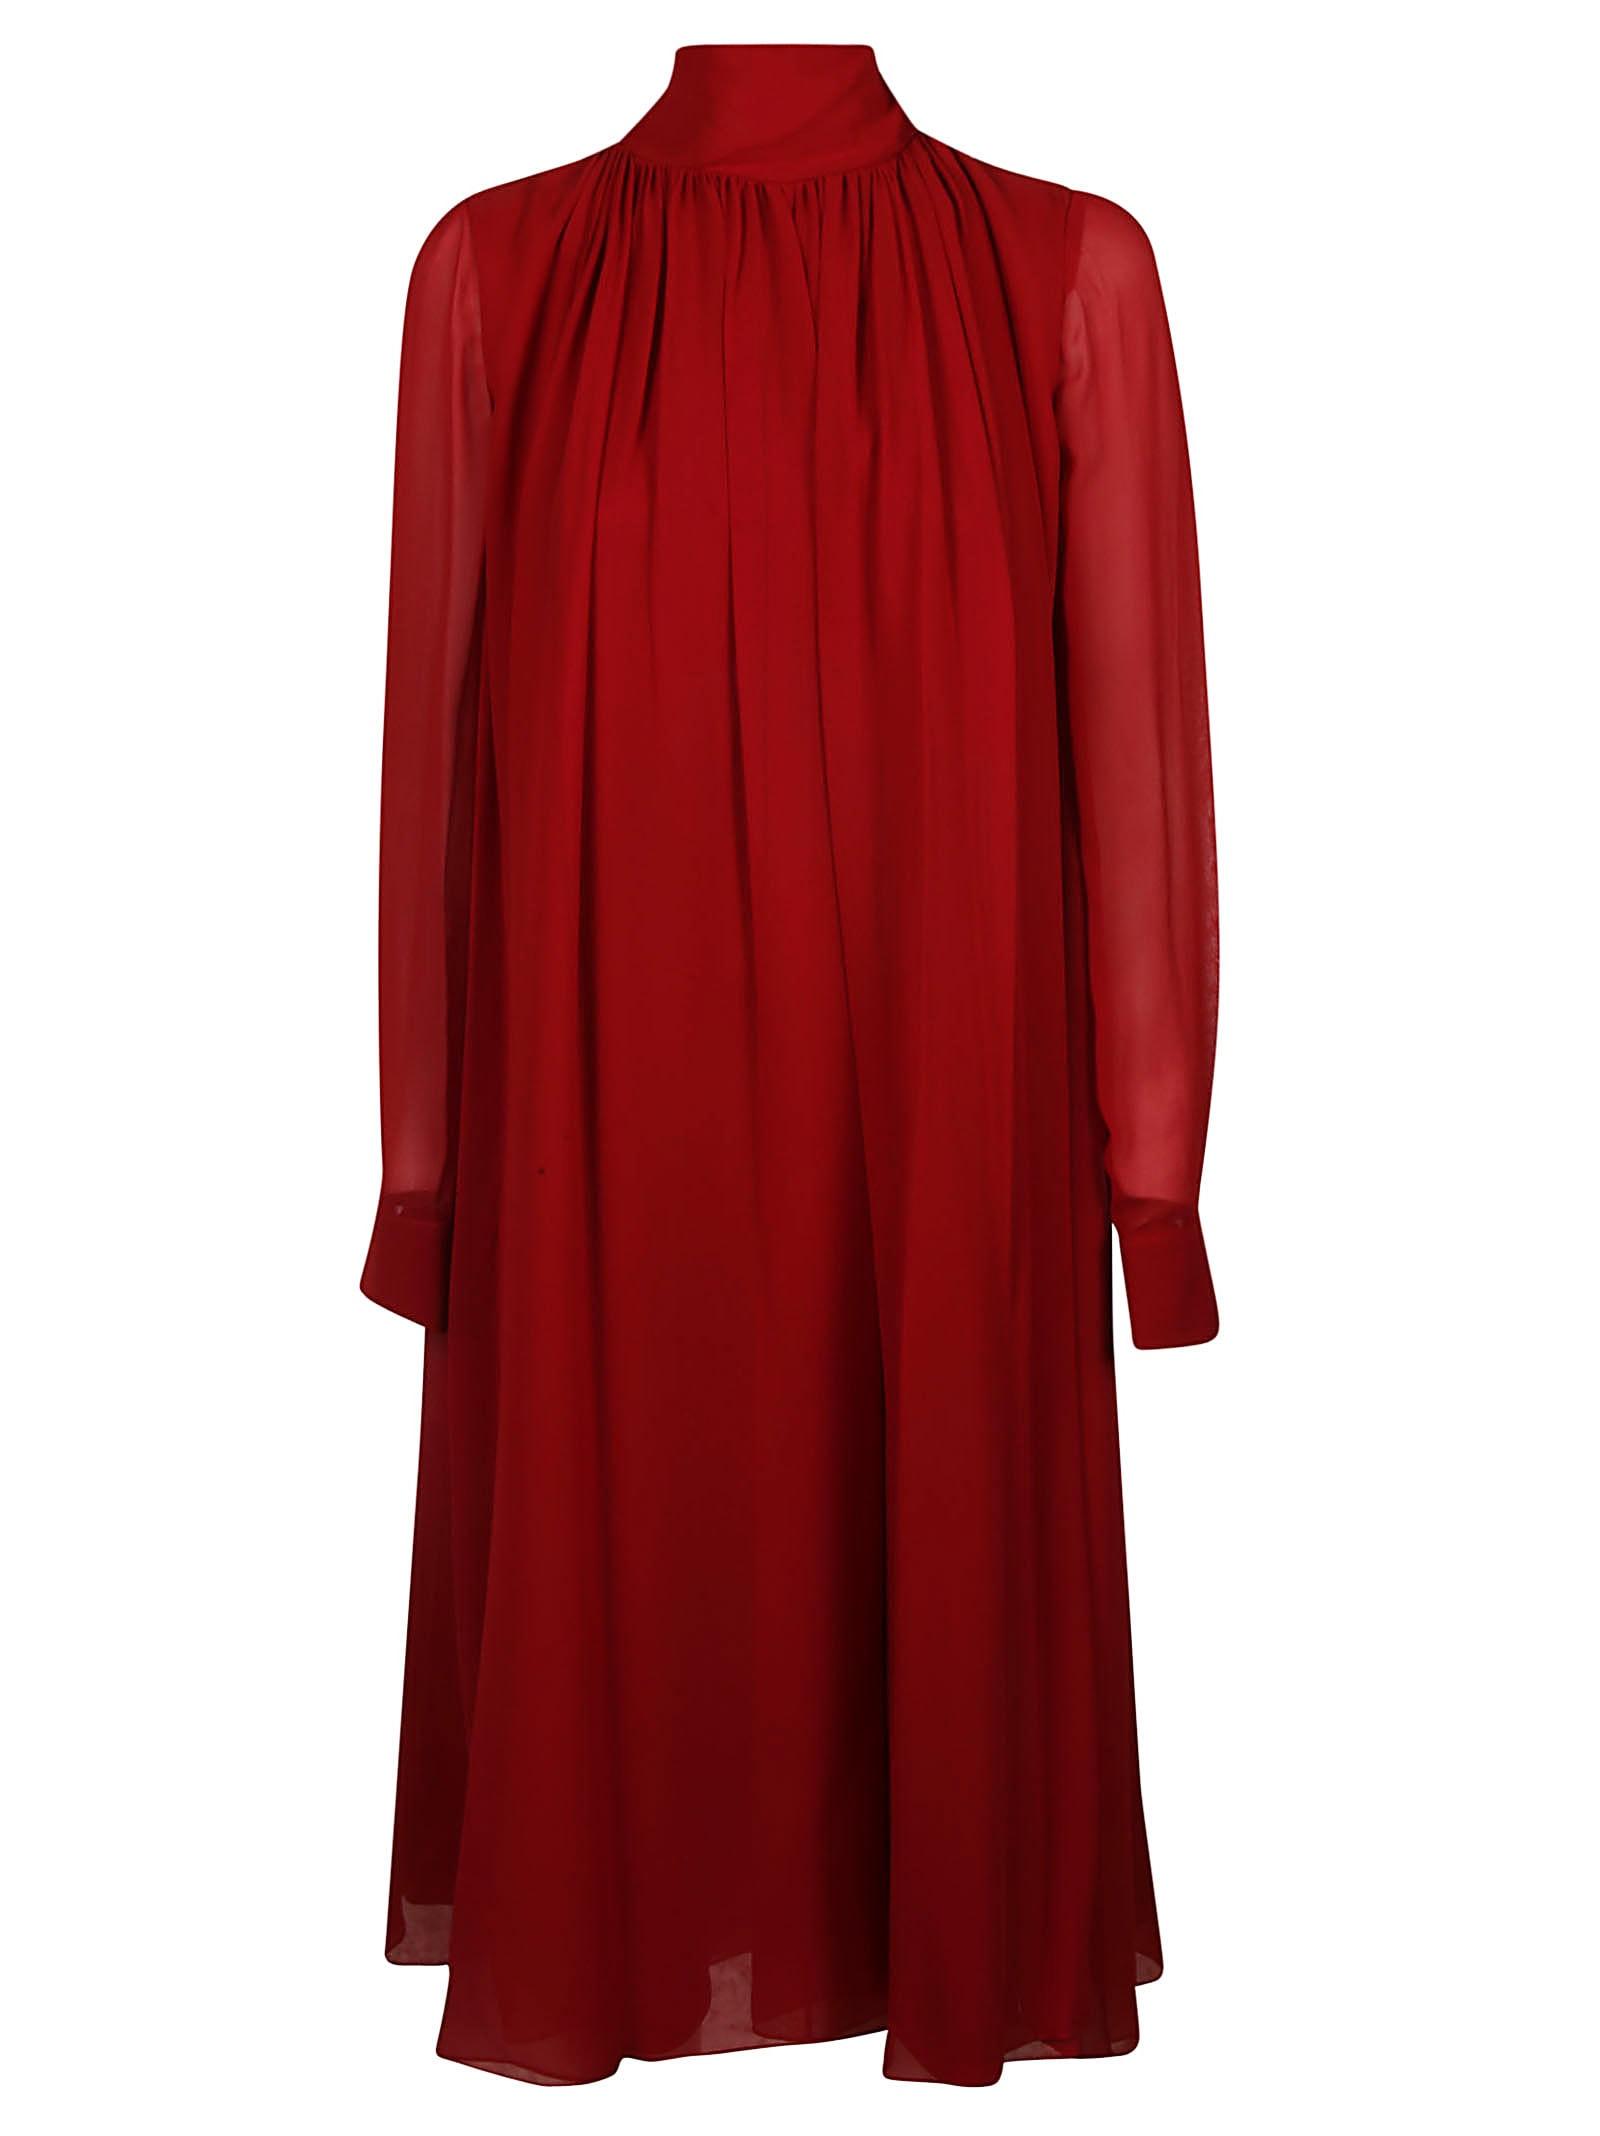 Max Mara Rugiada Dress